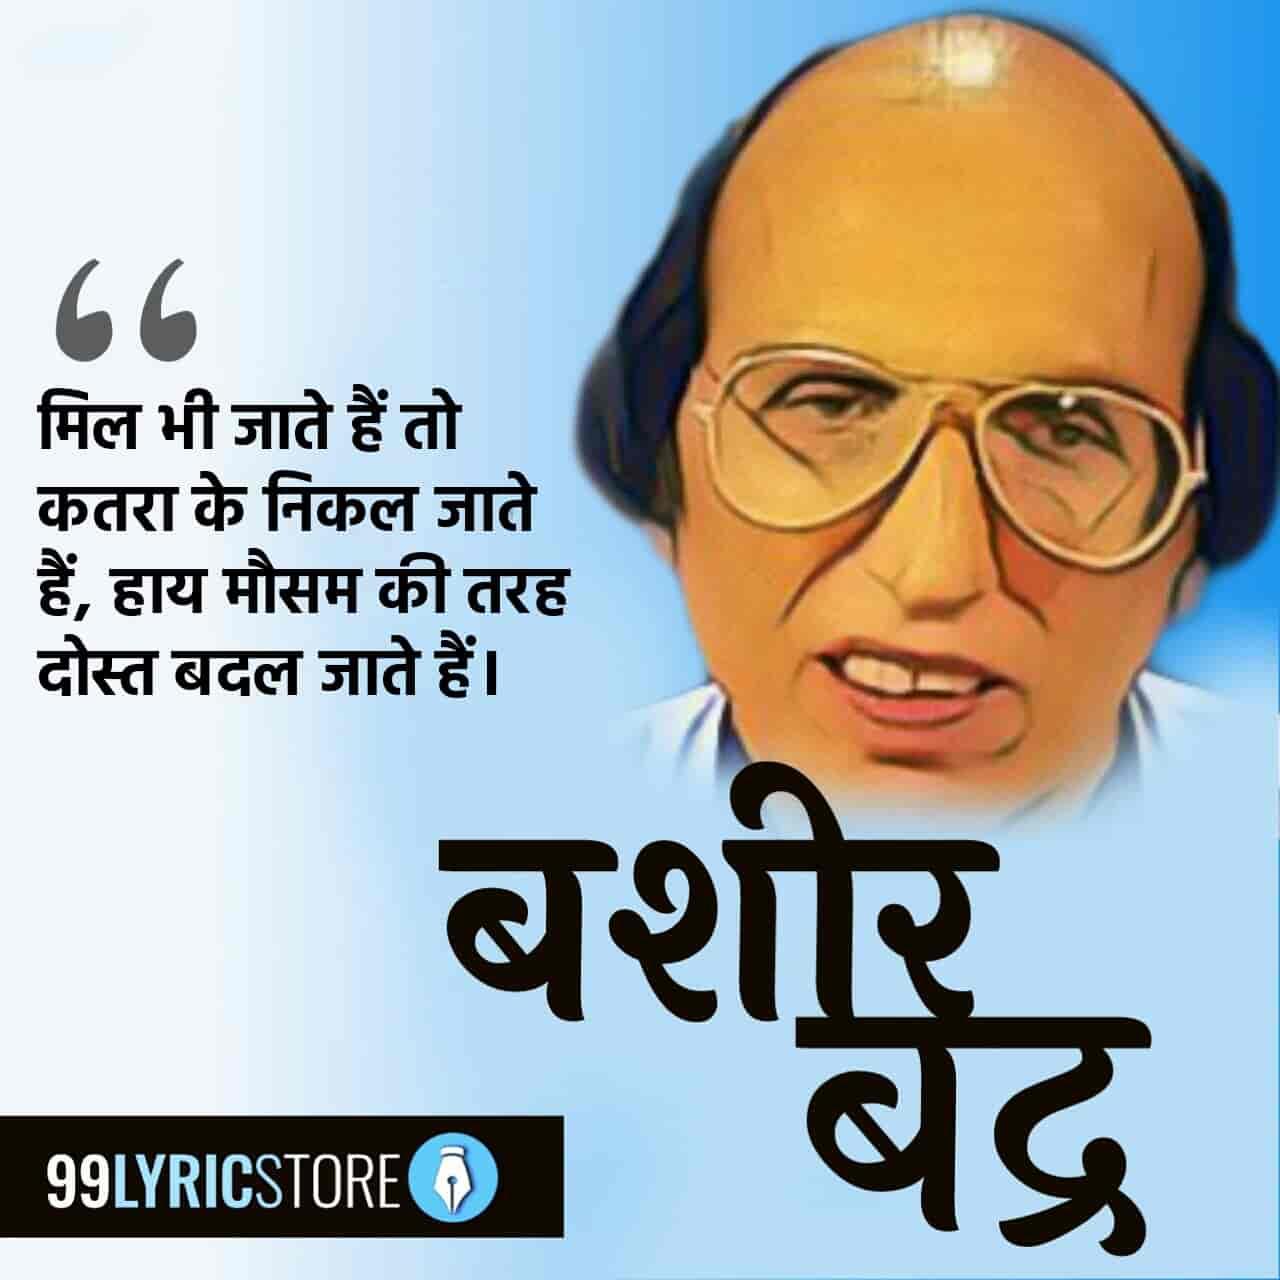 This beautiful ghazal 'Mil Bhi Jaate Hain To Katra Ke Nikal Jaate hai' has written by Bashir Badr.